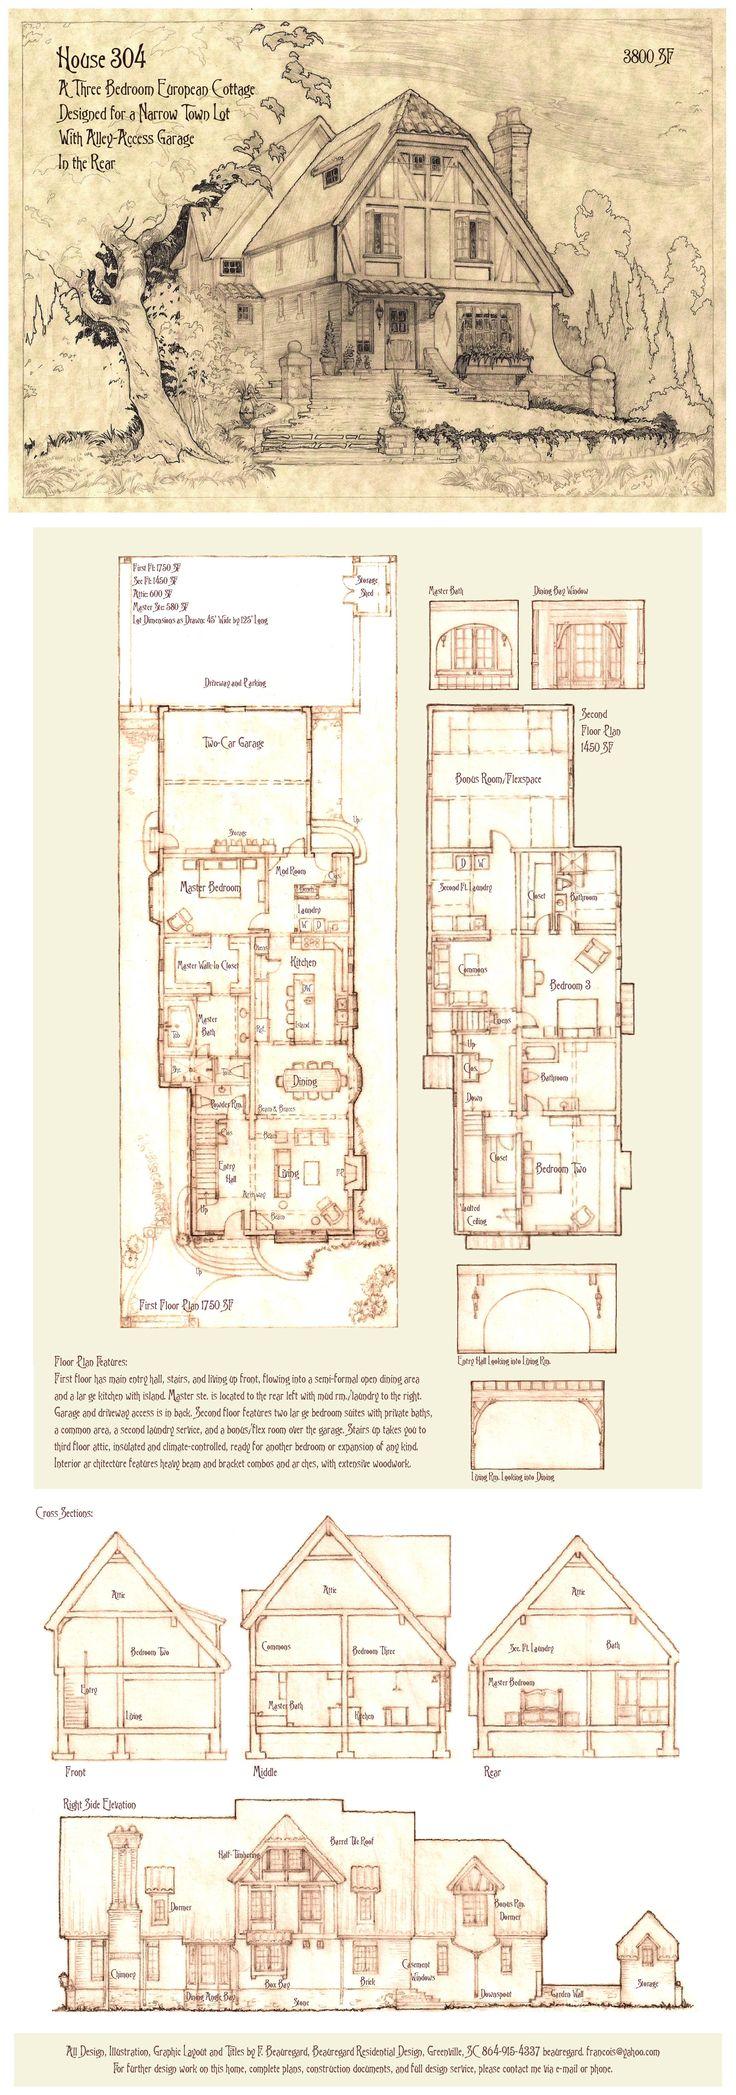 Home front bekommen design  best to build or not tombola build images on pinterest